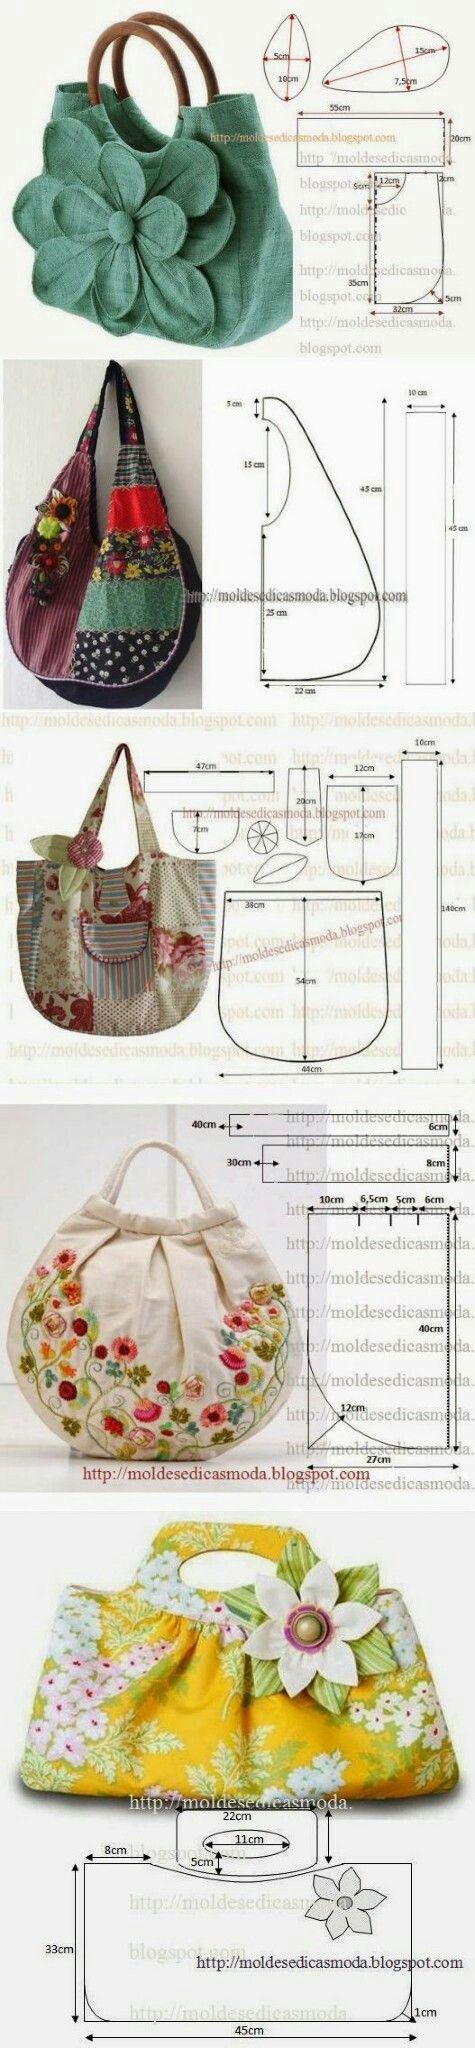 Patterns   Handtassen   Pinterest   Bolsos, Costura y Patrones